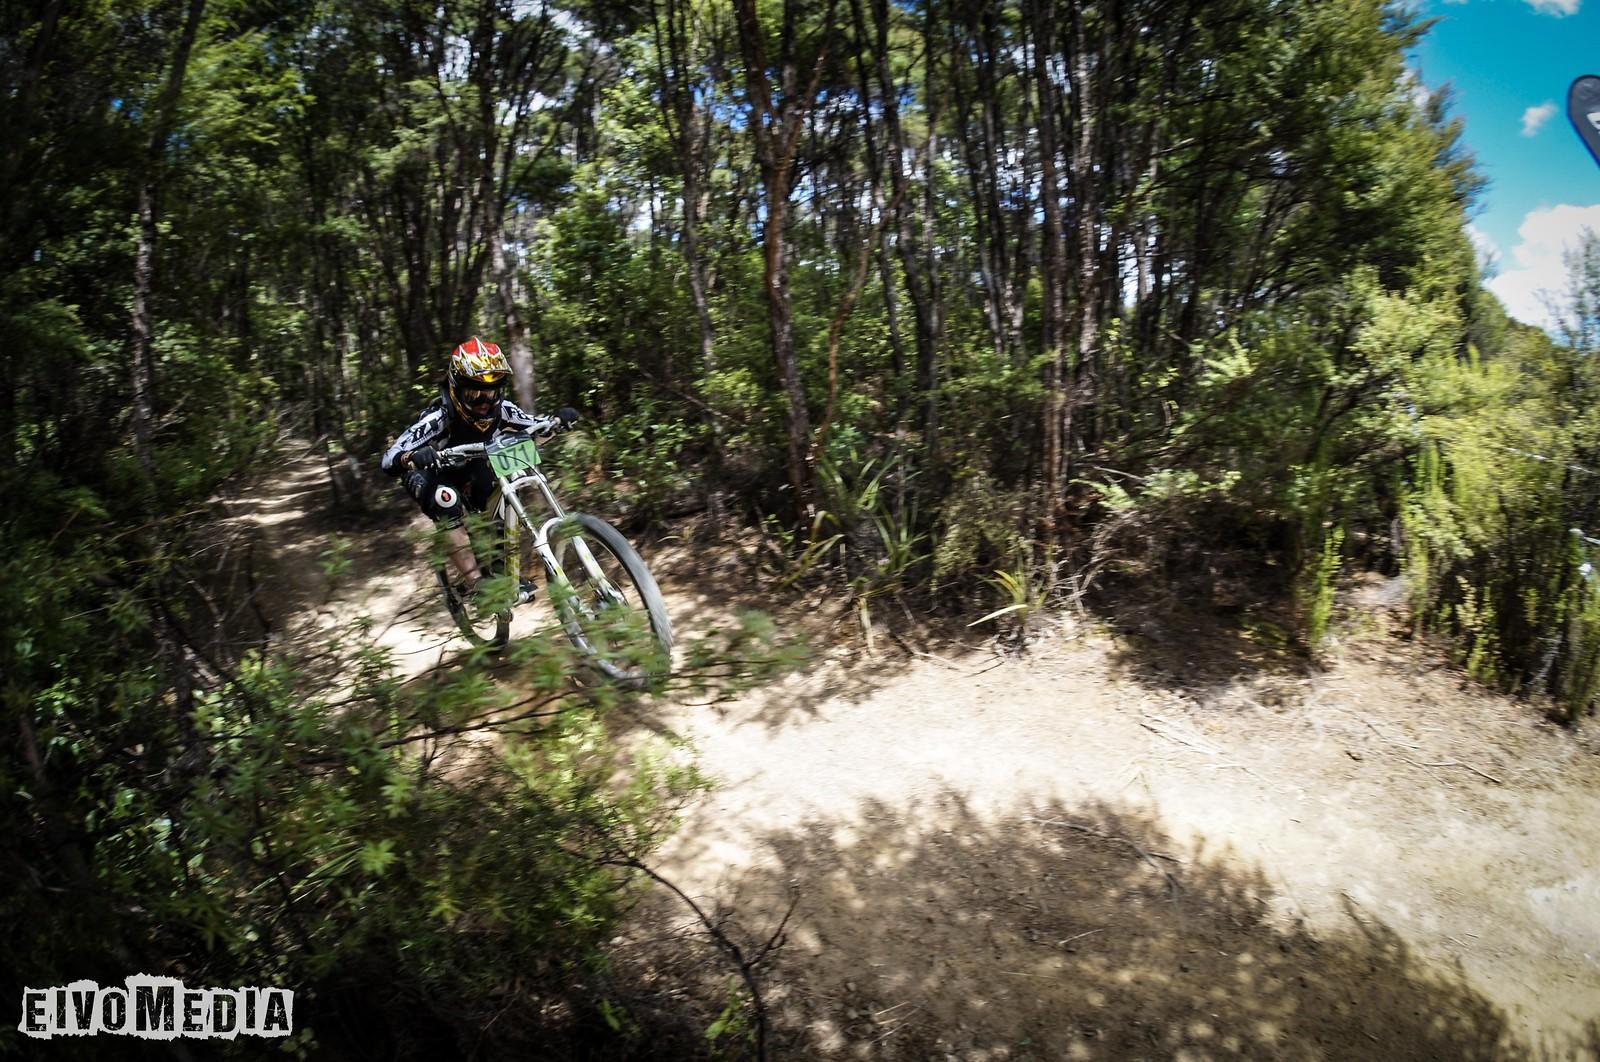 Hunua DH-23 - EIVOMEDIA - Mountain Biking Pictures - Vital MTB